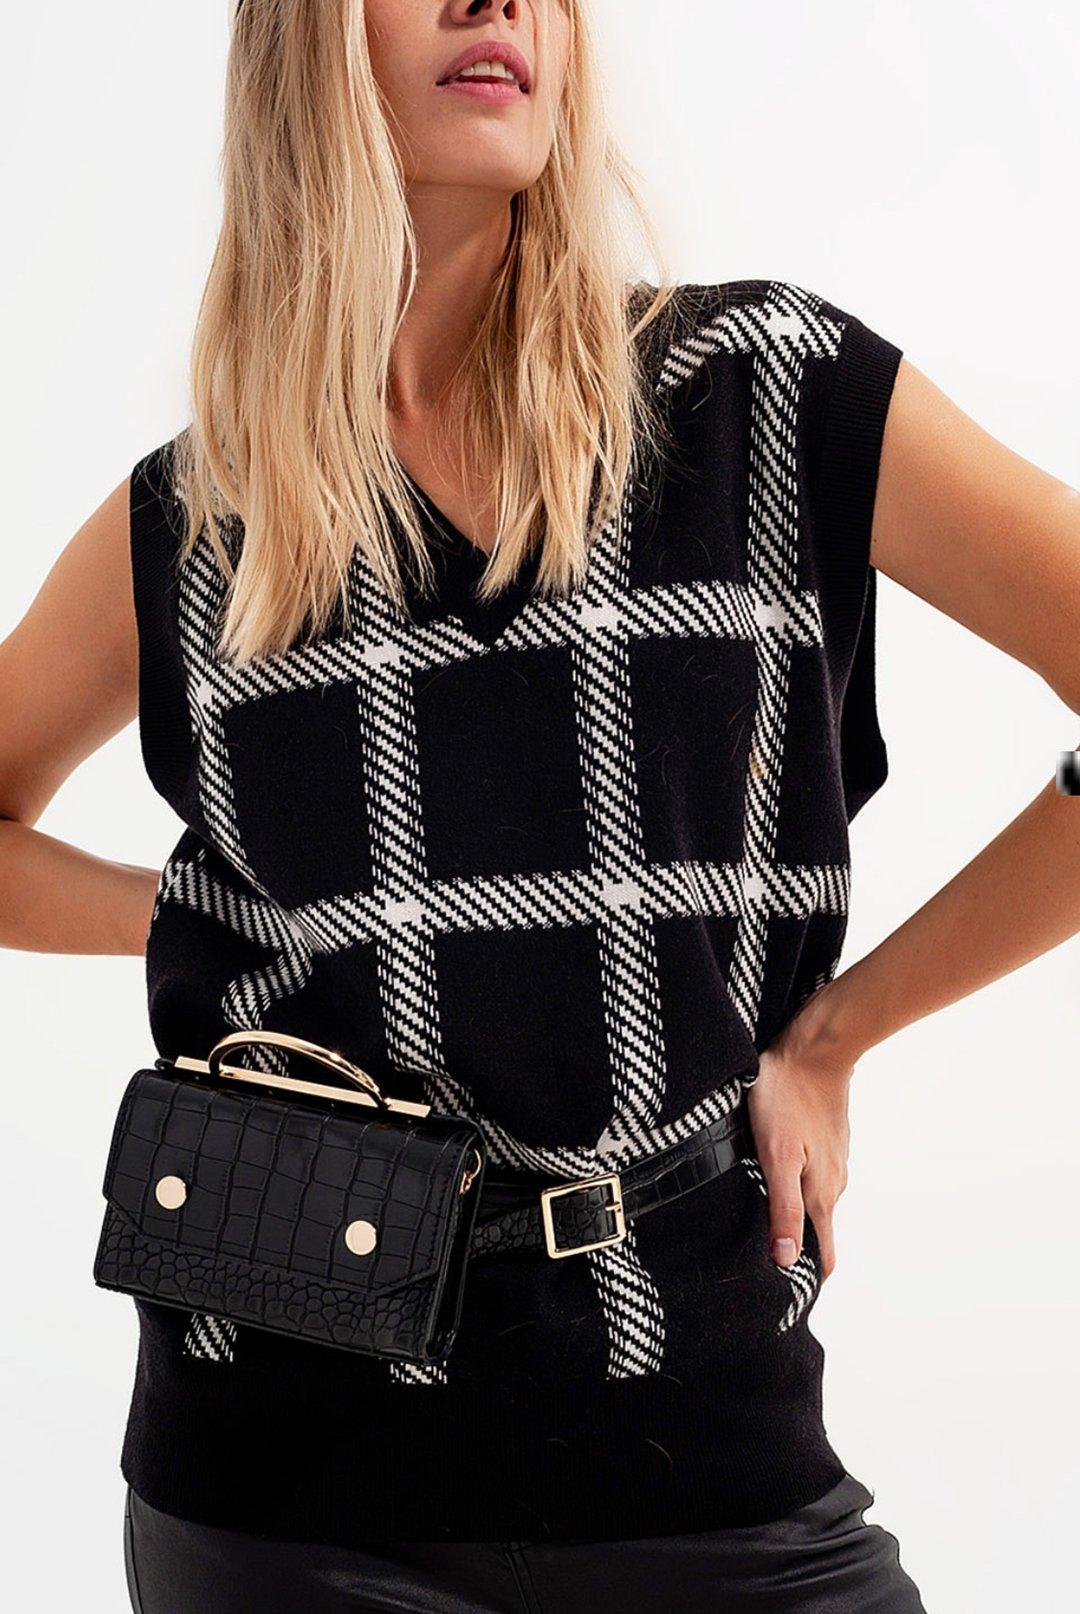 Black & White knitted Sweater Vest